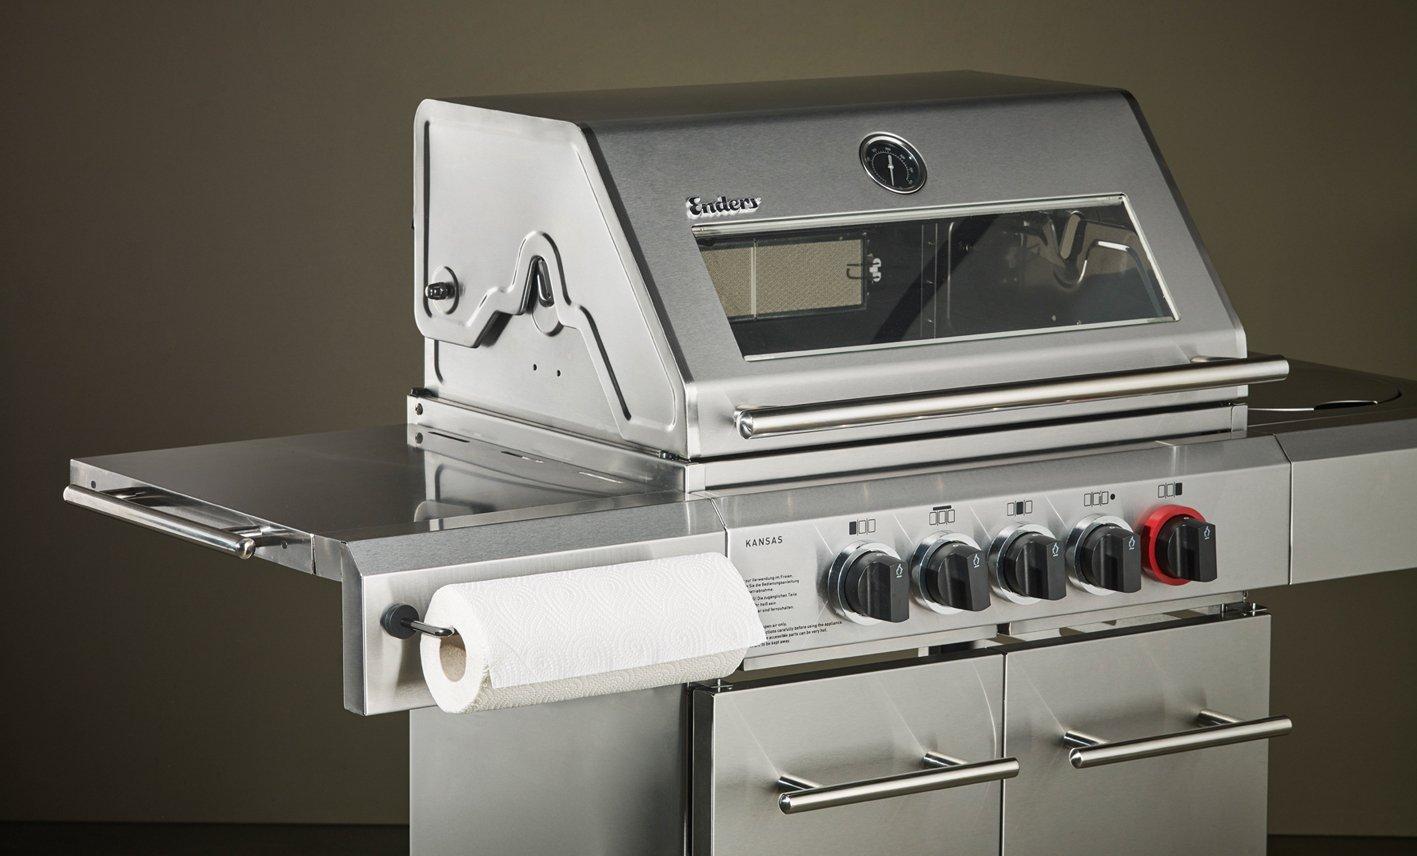 Enders Gasgrill Kansas 4 : Enders outdoor küche kansas pro sik profi turbo enders outdoor